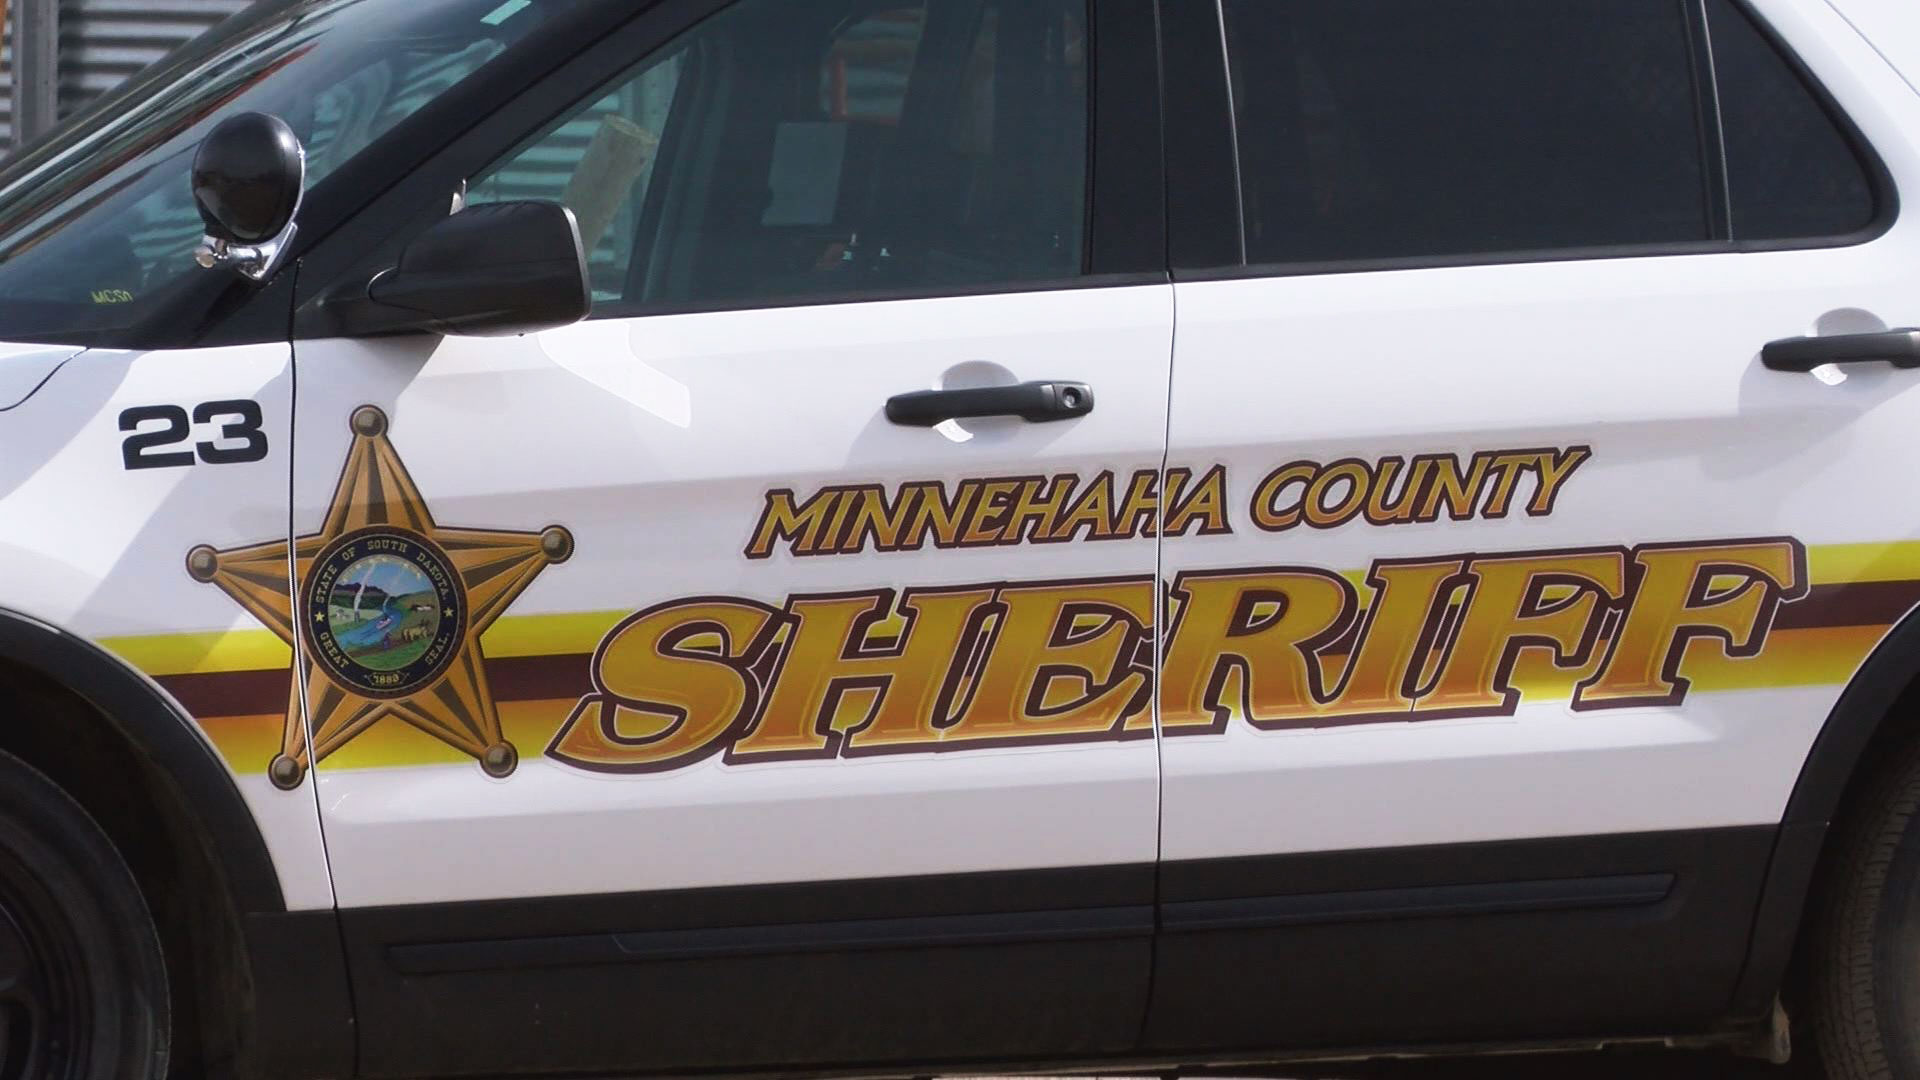 KELO Minnehaha County Sheriff